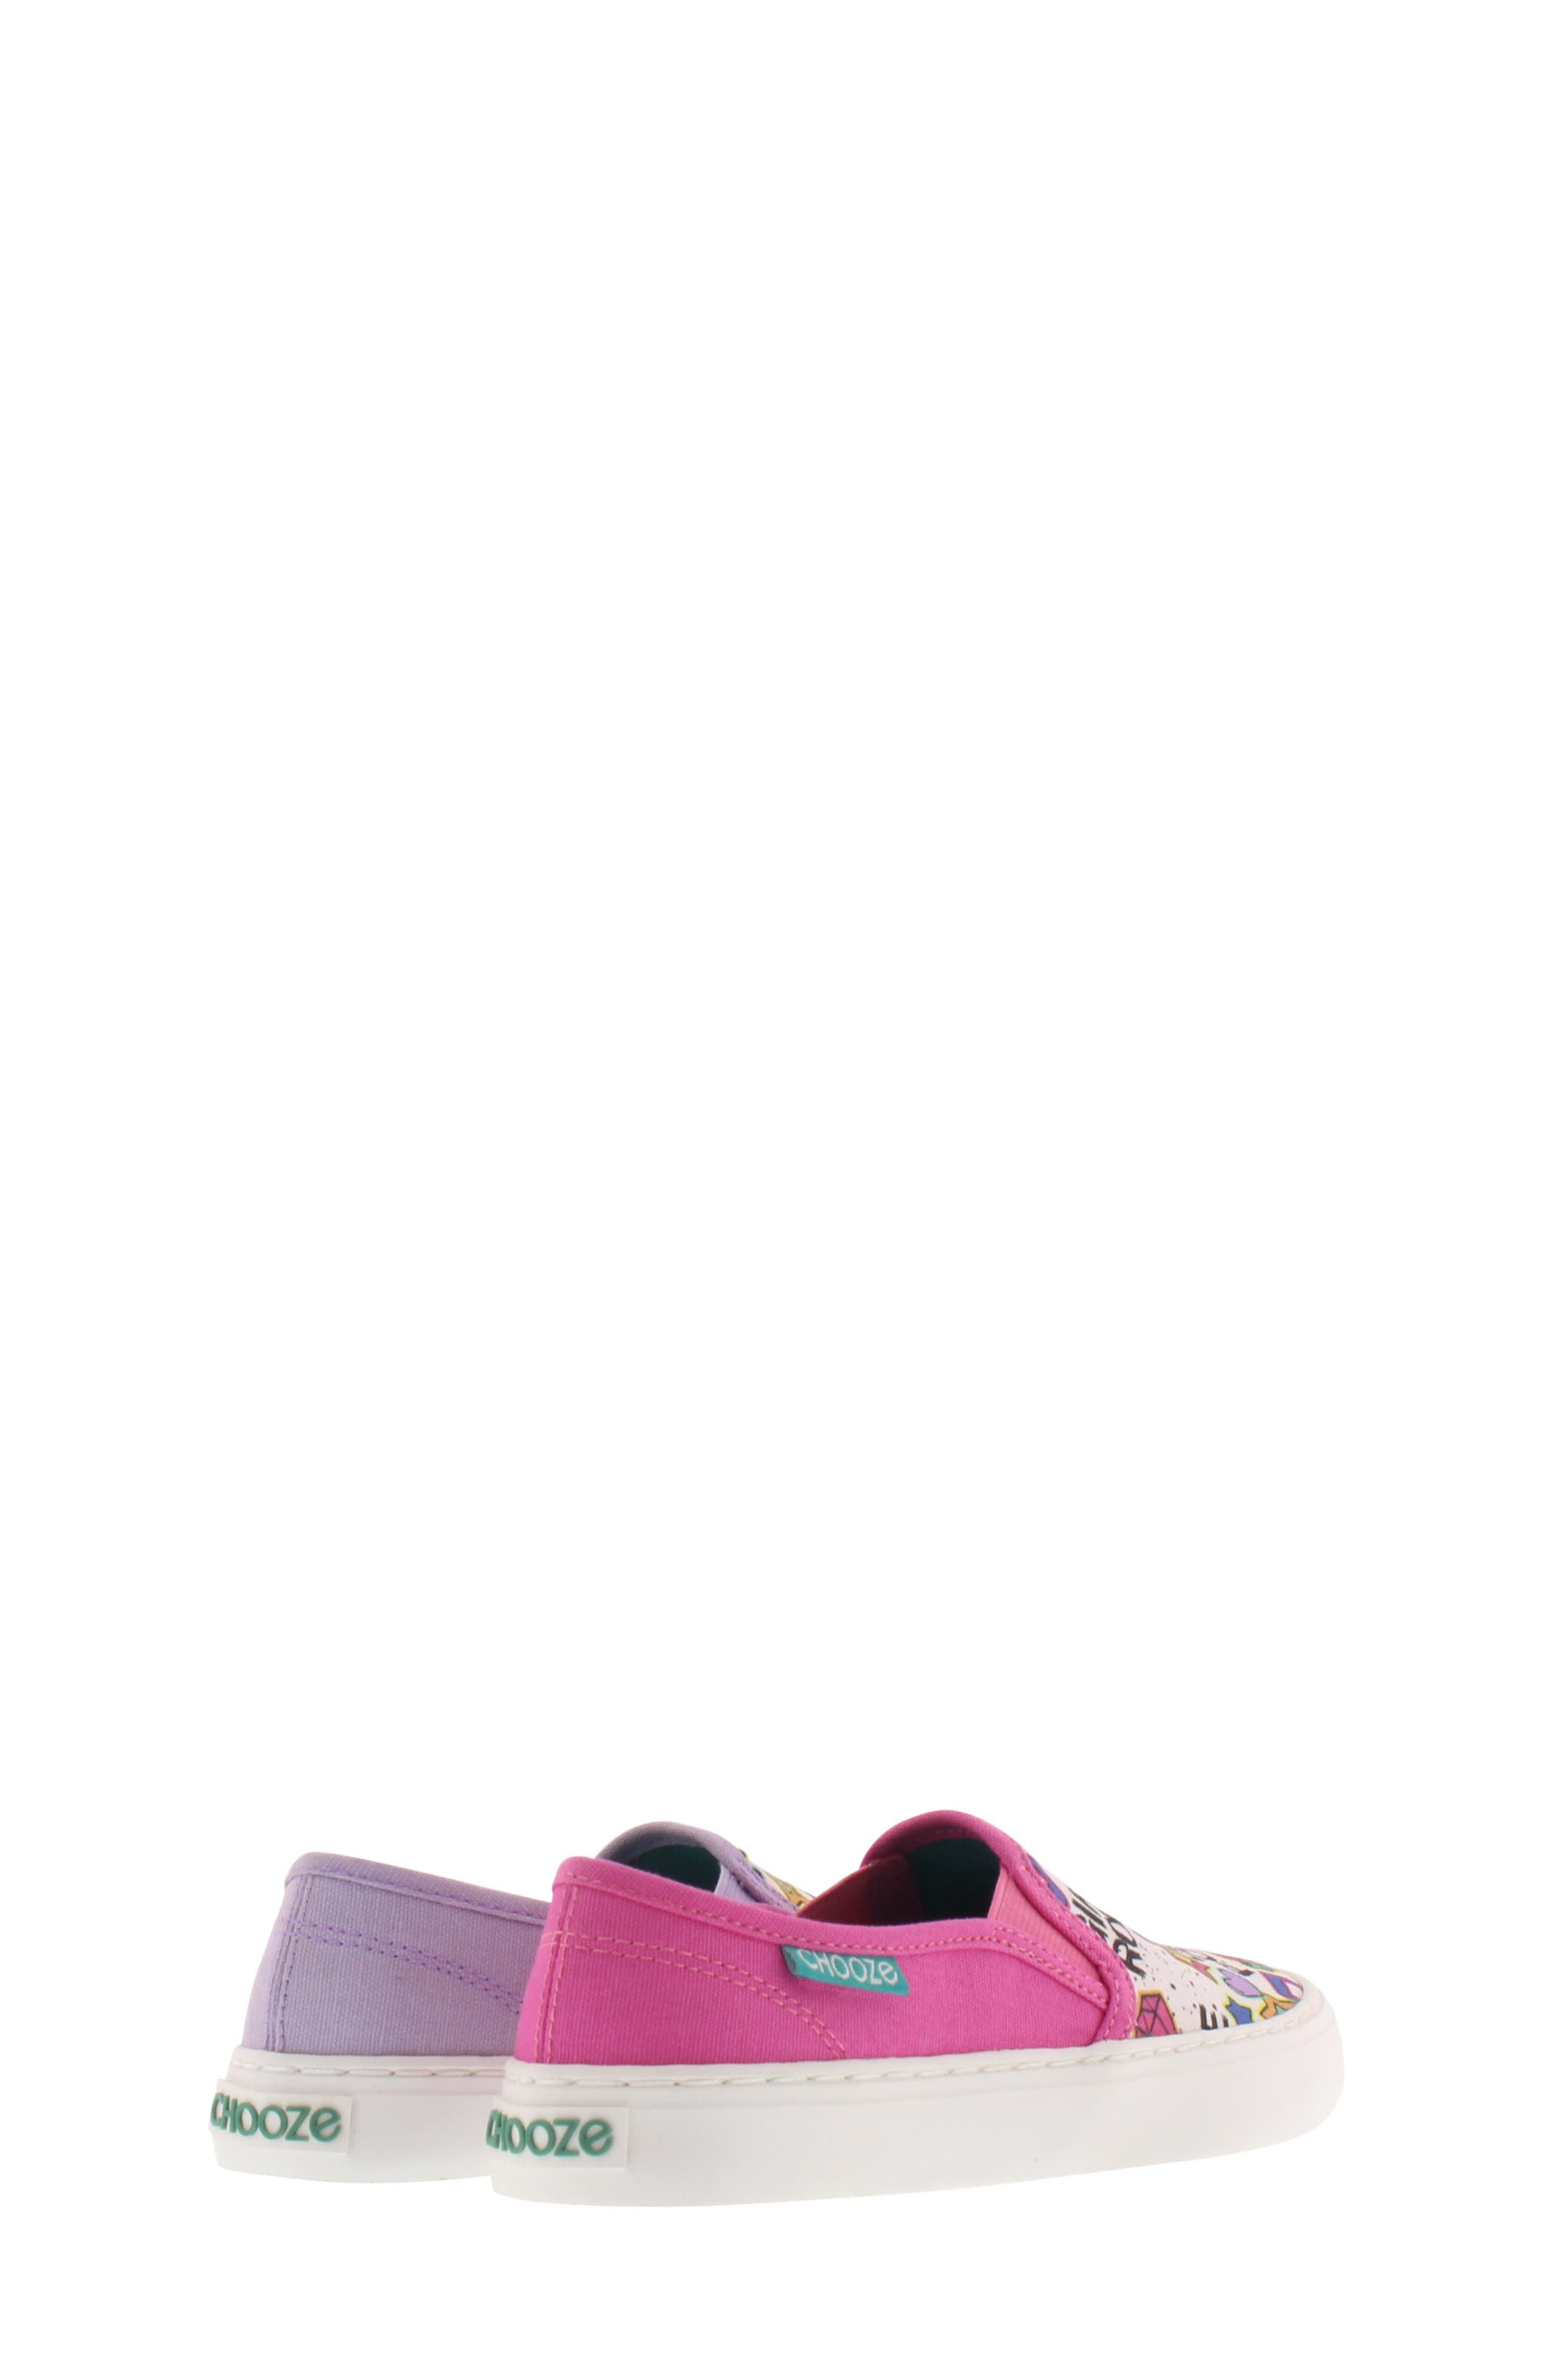 CHOOZE, Move Motion Slip-On Sneaker, Alternate thumbnail 2, color, PINK LAVENDER